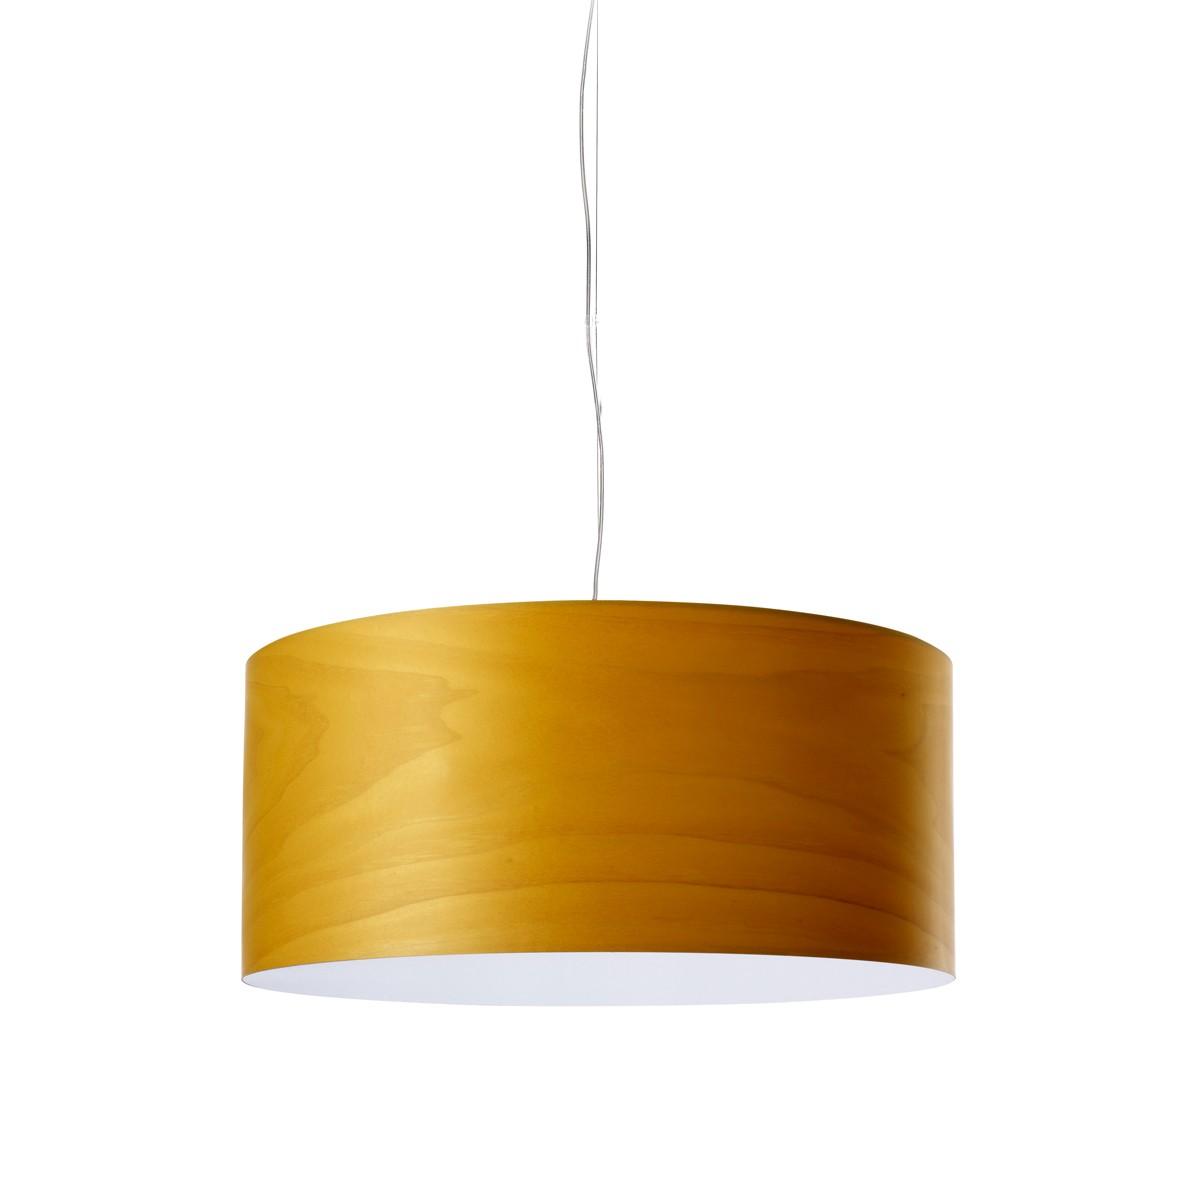 LZF Lamps Gea Small Pendelleuchte, gelb